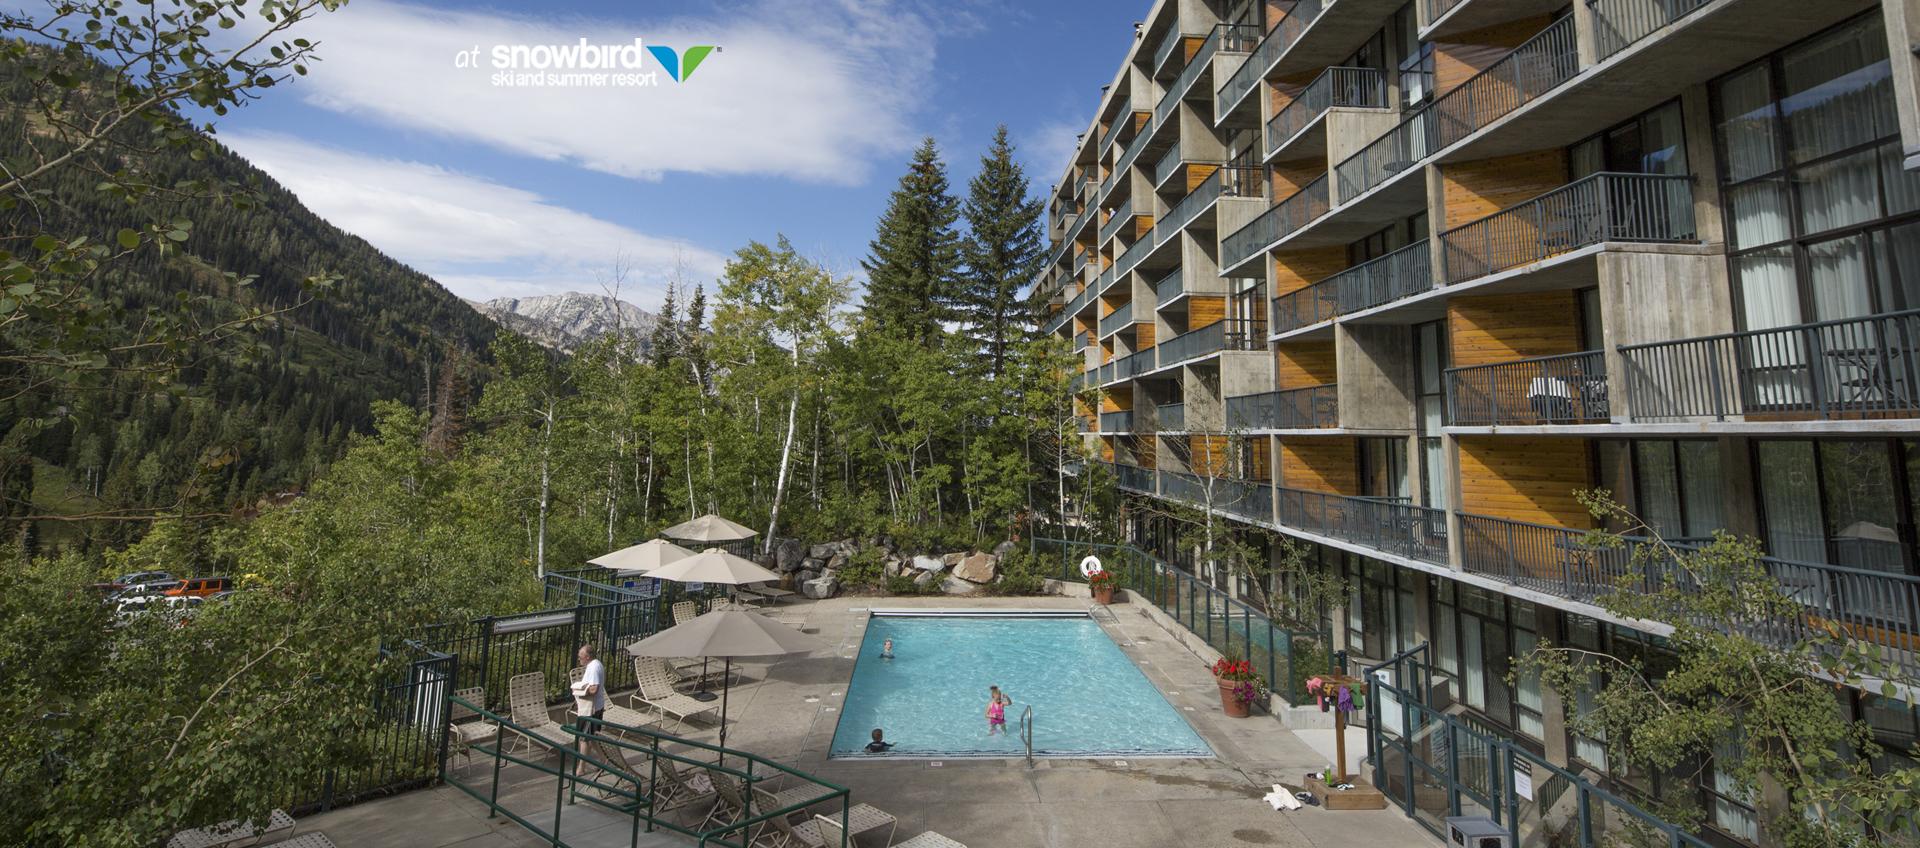 Iron Blosam Lodge Ski In Ski Out Timeshare Condominium